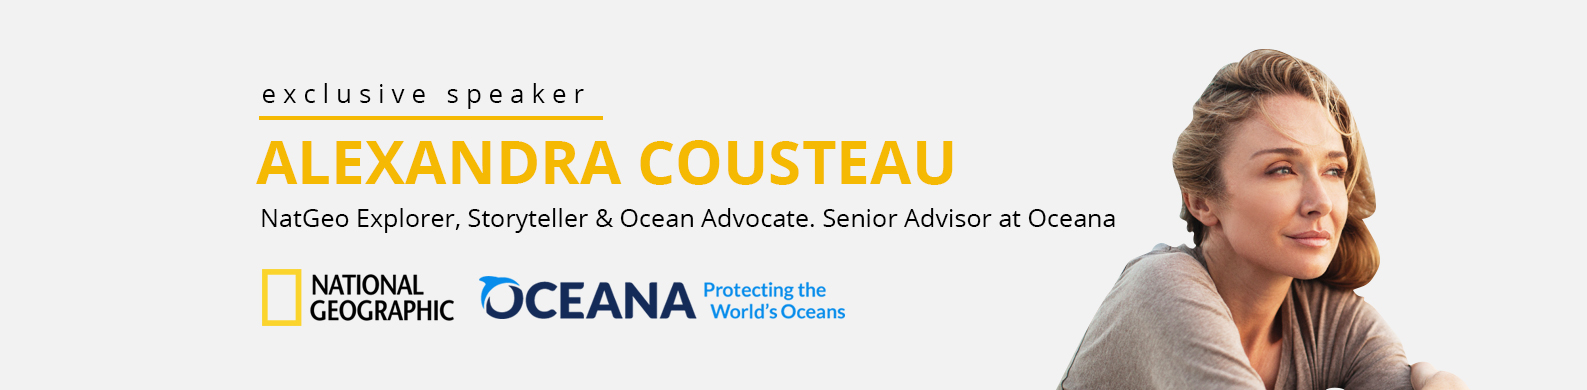 alexandra cousteau banner